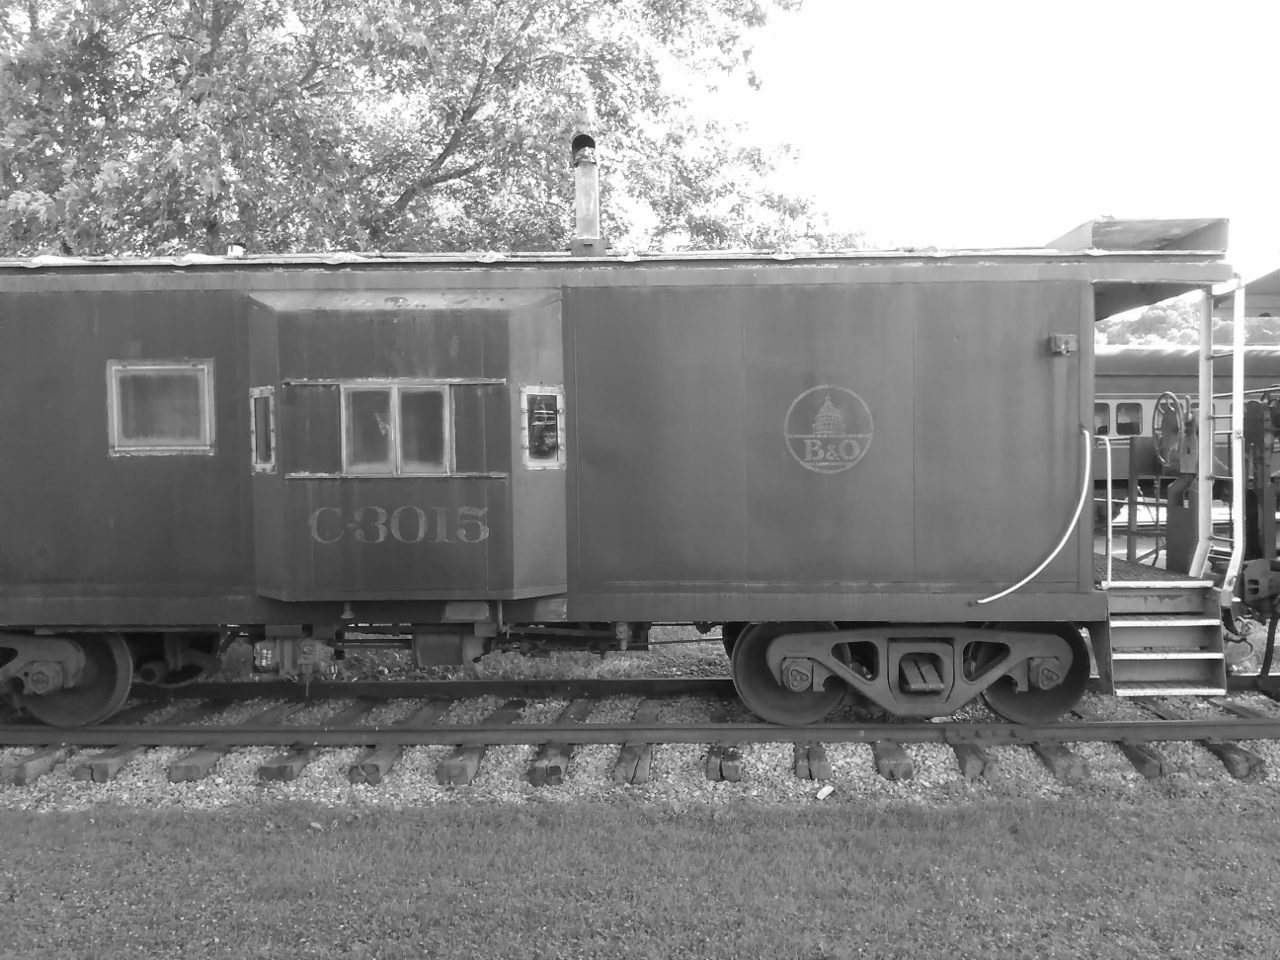 Hocking Valley Scenic Railway - BW 6-14-2018 6-35-00 PM